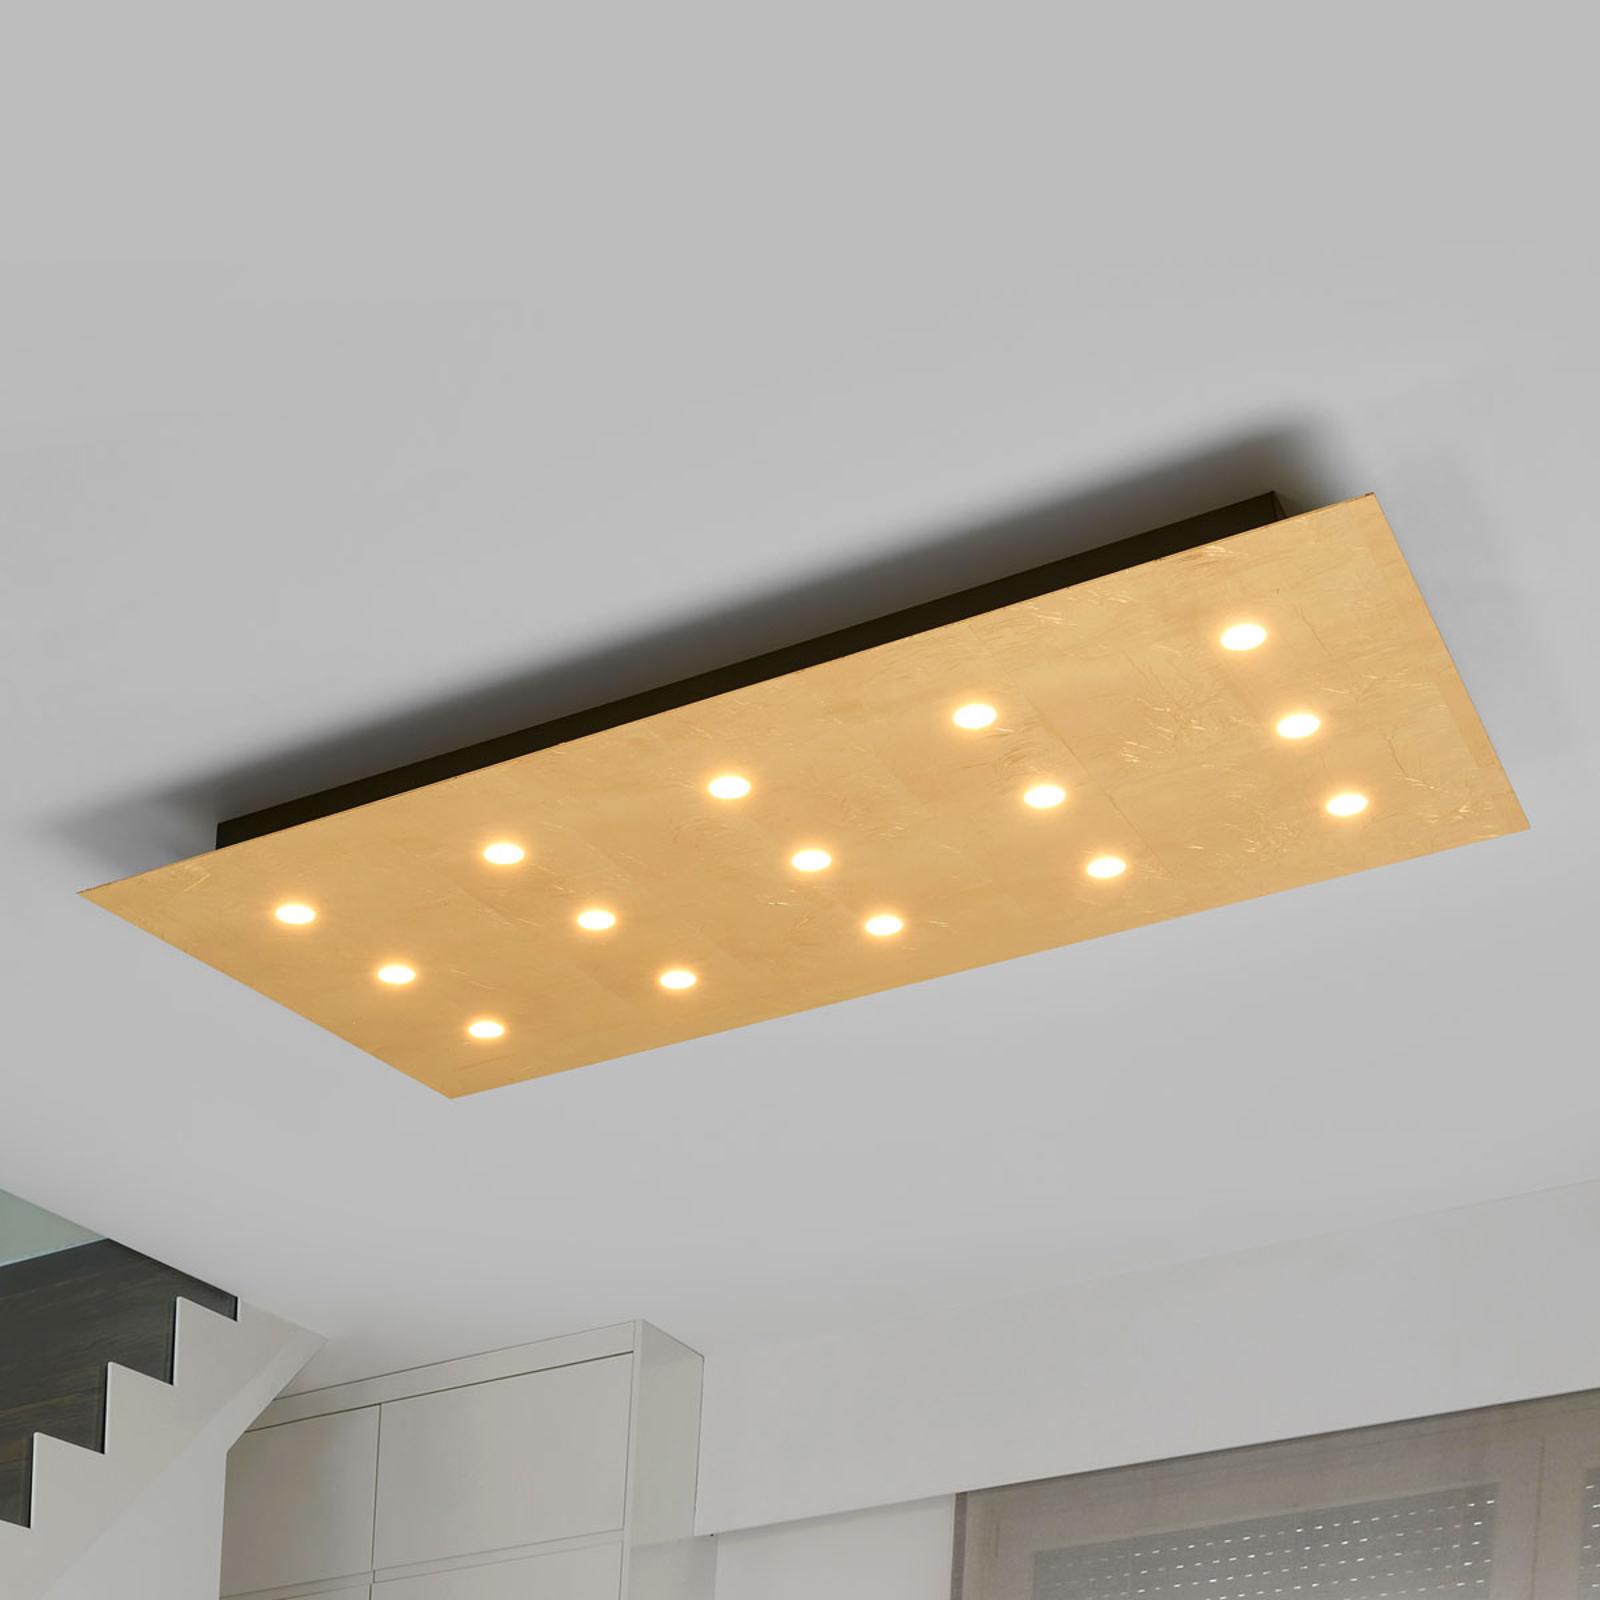 Met 15 LED's - dimbare plafondlamp Juri, goud